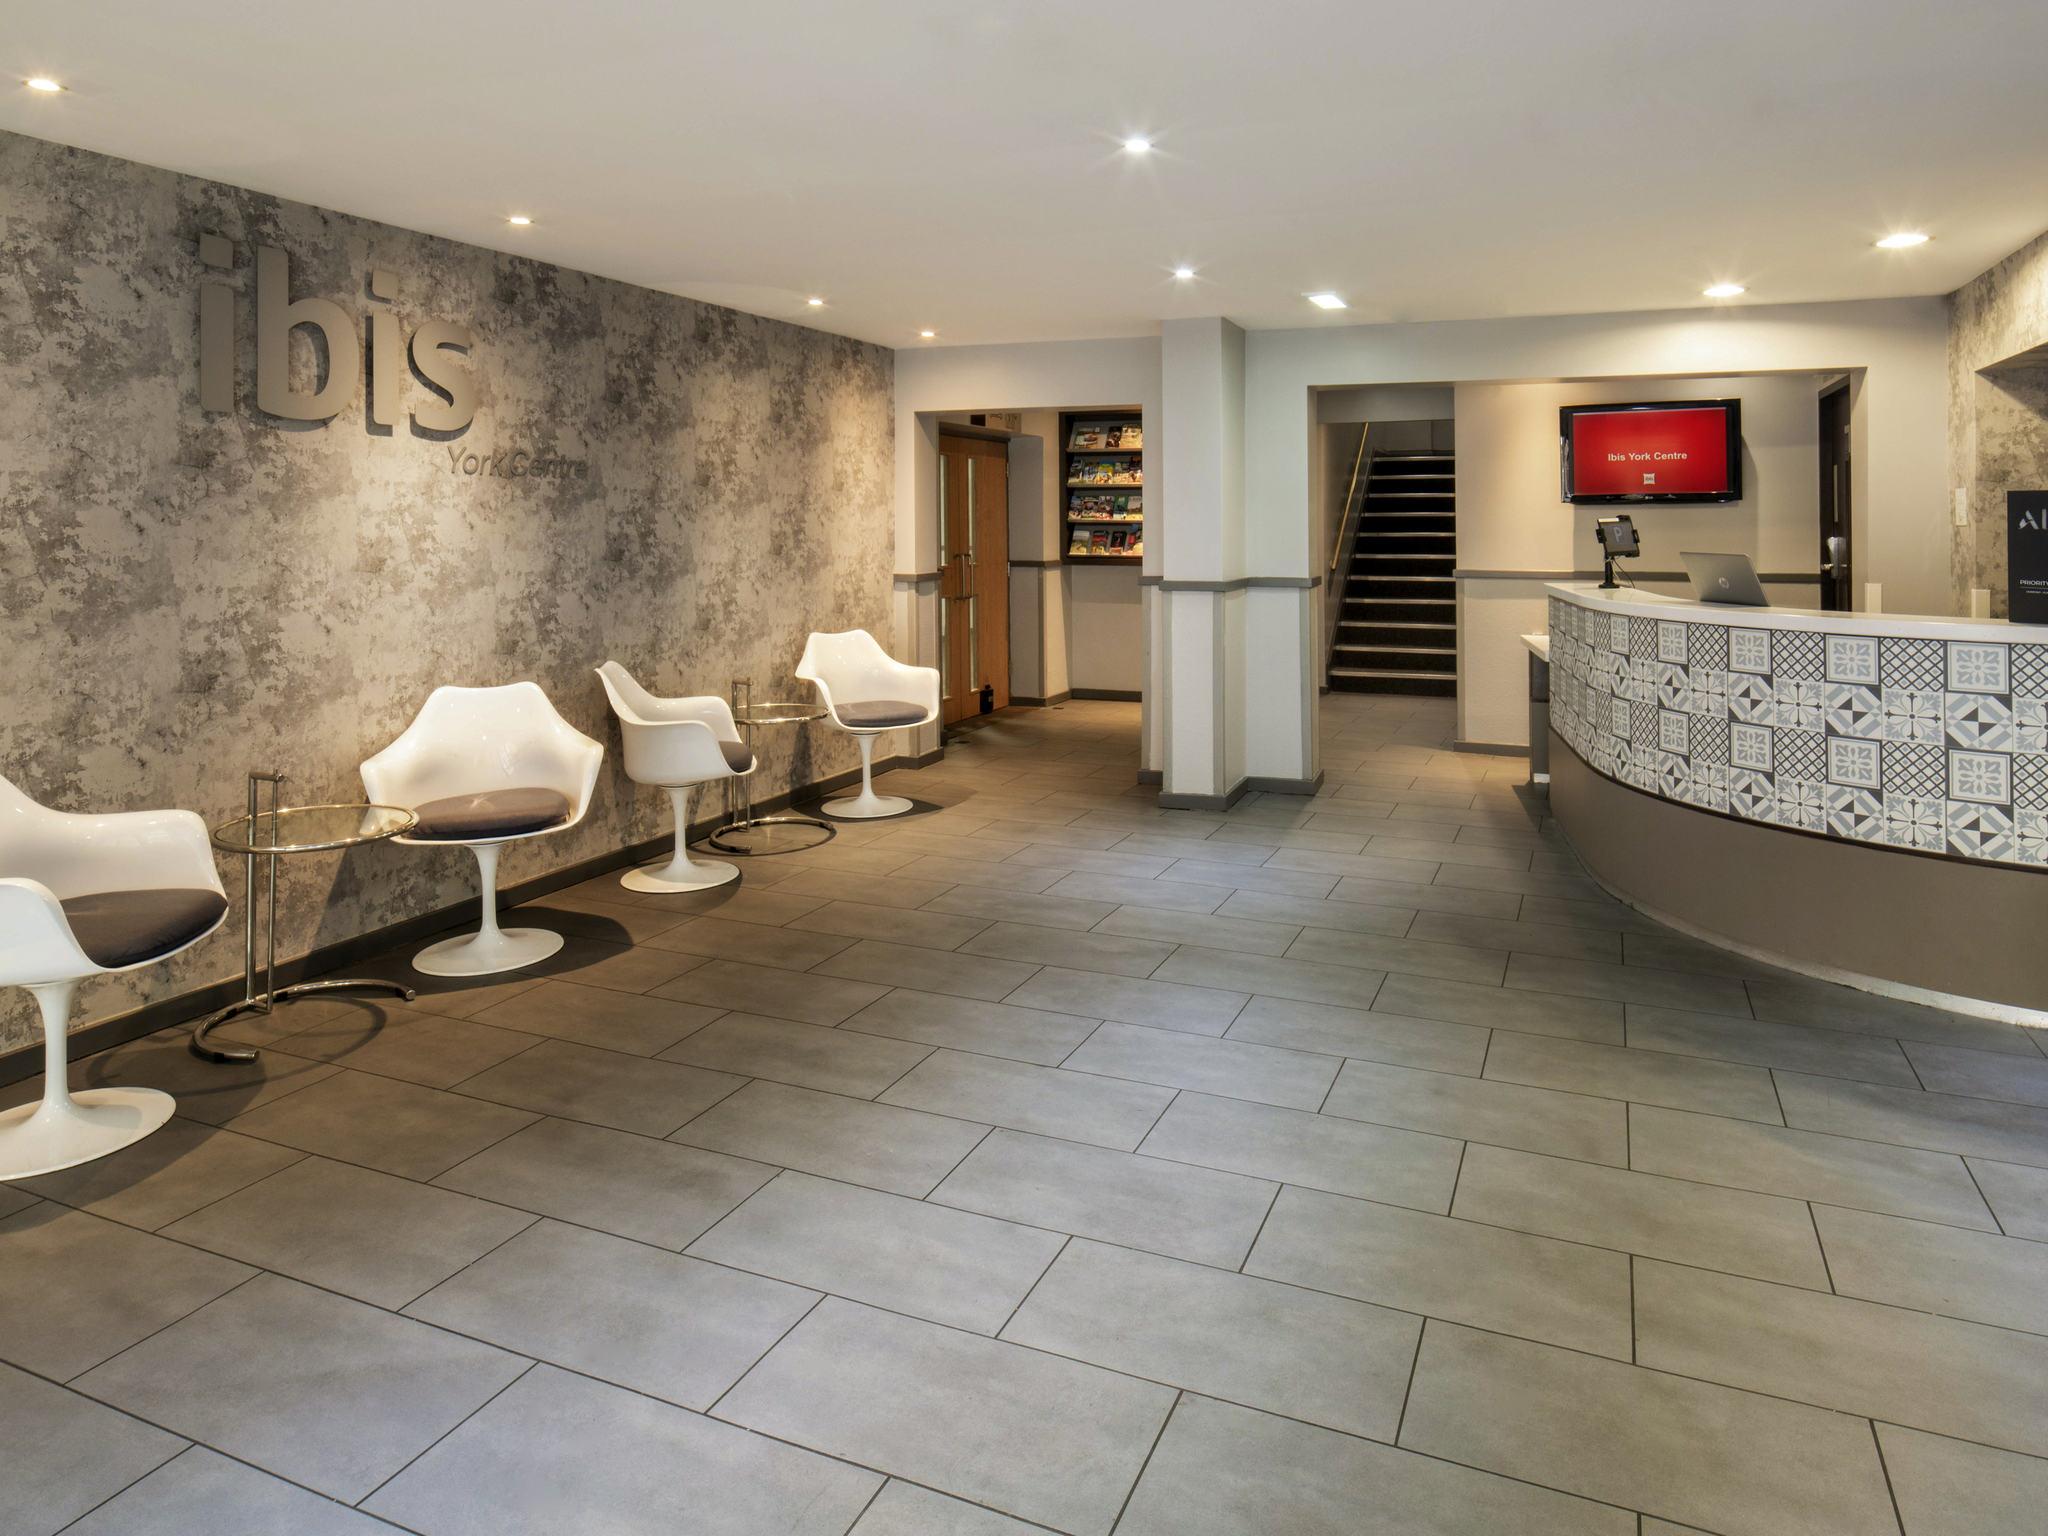 Hotel Ibis York Centre